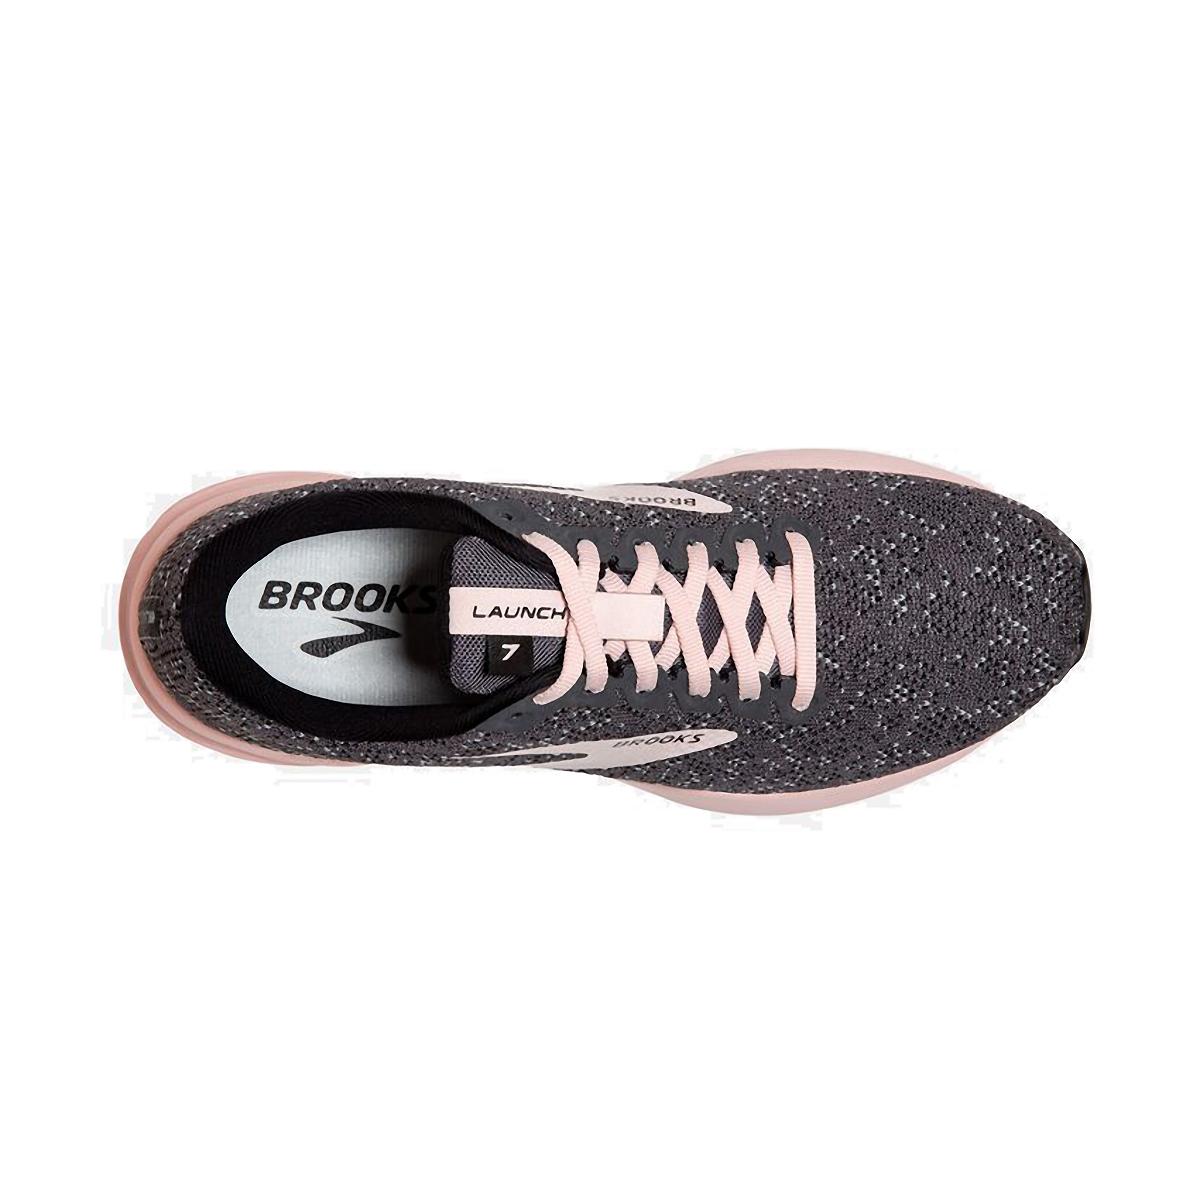 Women's Brooks Launch 7 Running Shoe - Color: Black/Pearl/Pink - Size: 5 - Width: Regular, Black/Pearl/Pink, large, image 5